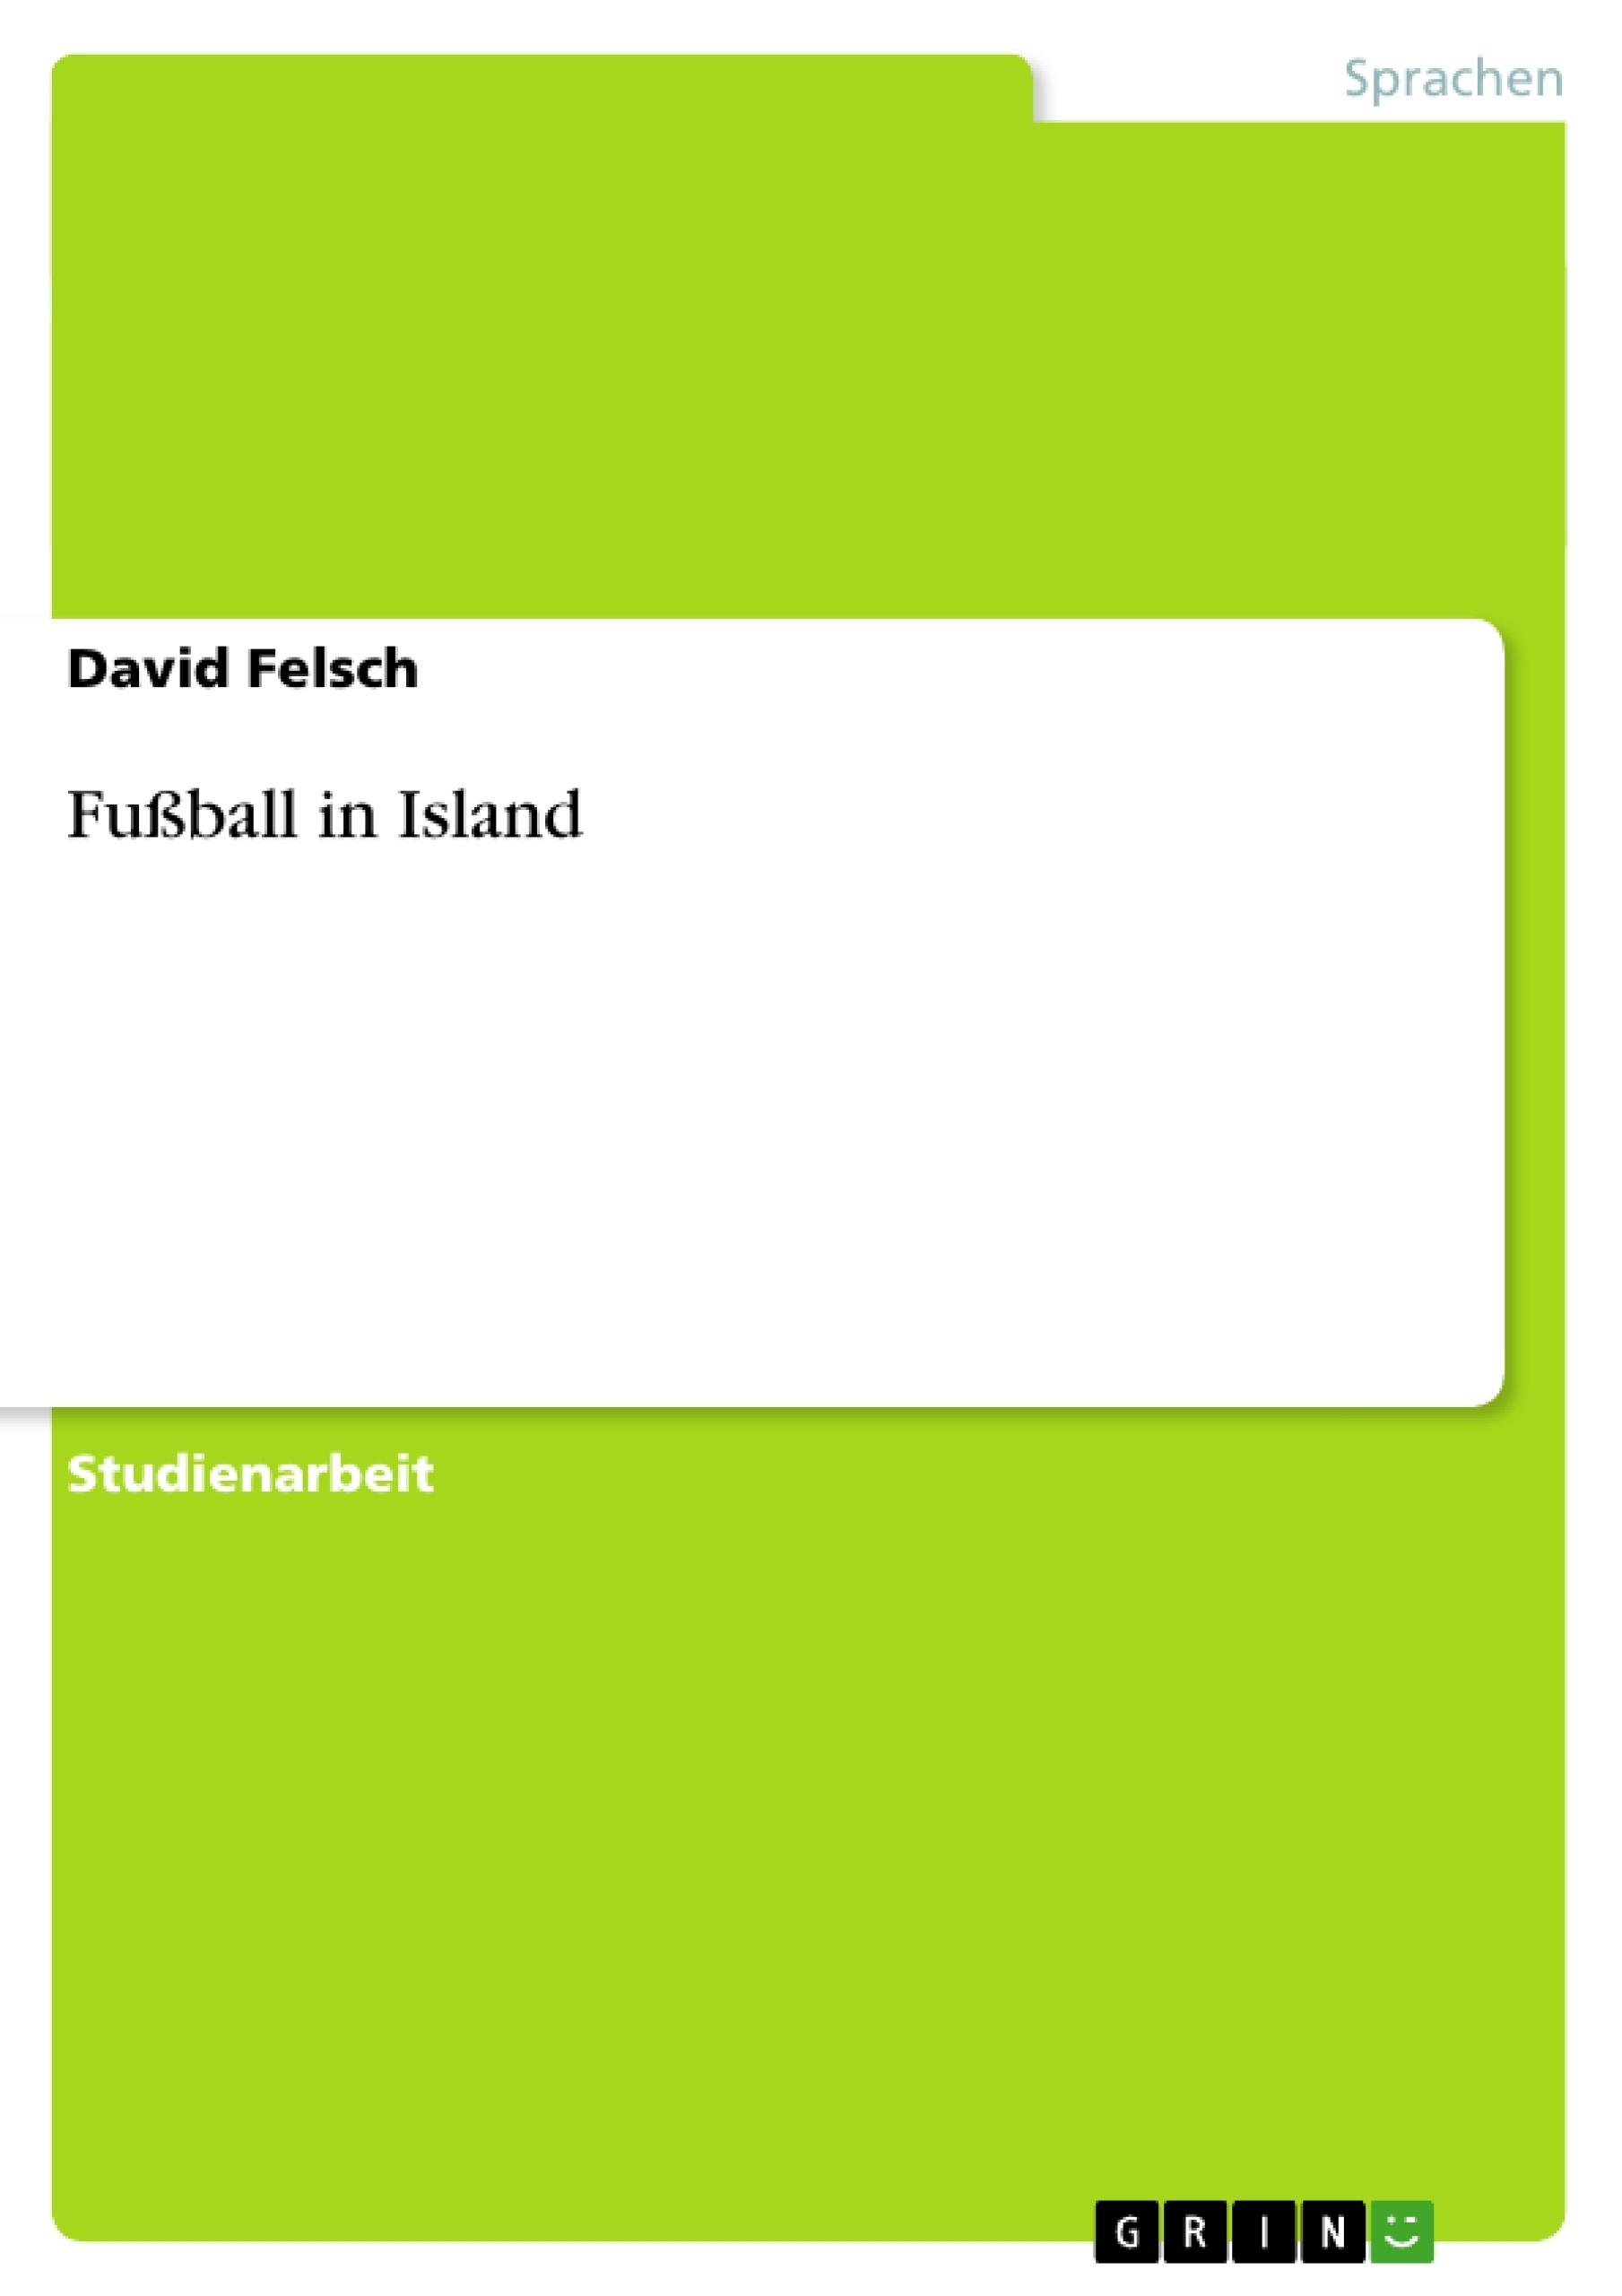 Titel: Fußball in Island